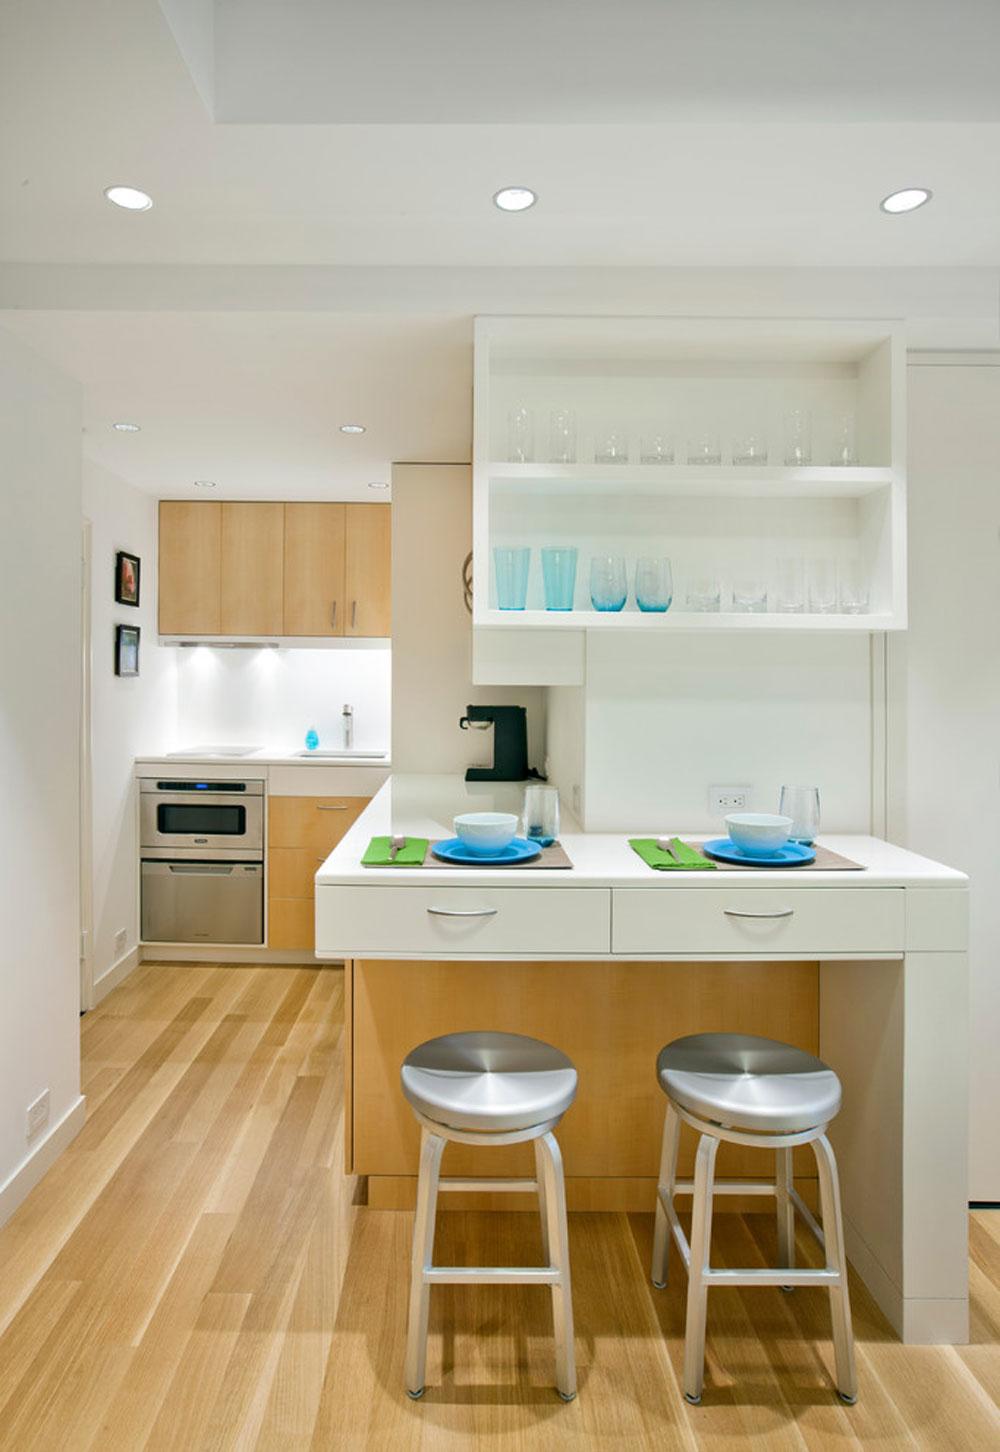 Micro-apartment-by-AllenKillcoyne-Architects-1